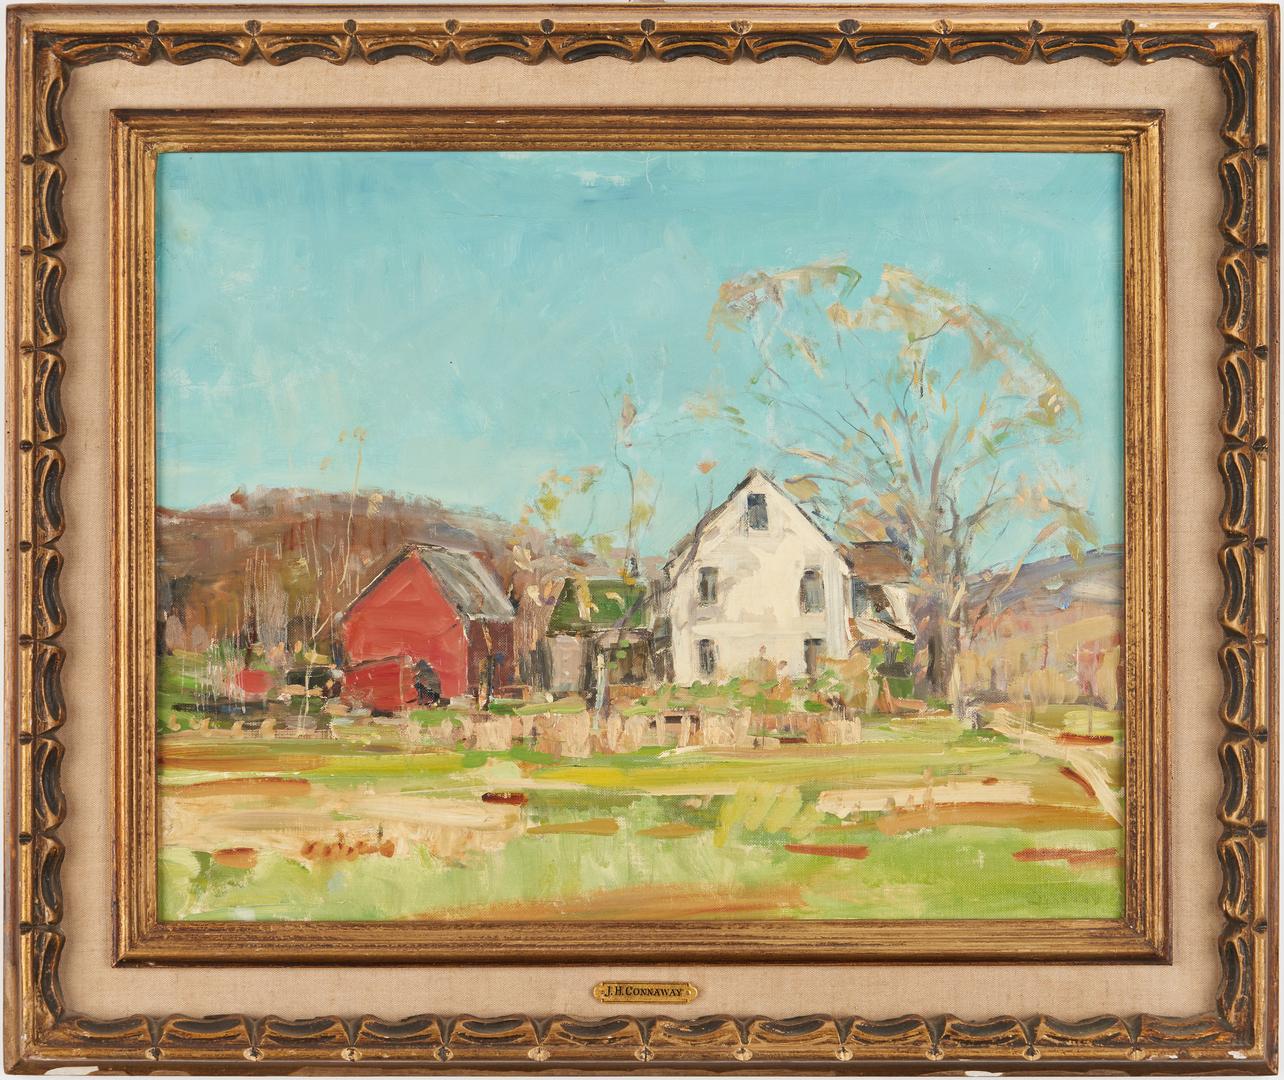 Lot 369: Jay H. Connaway O/B, Spring on the Farm